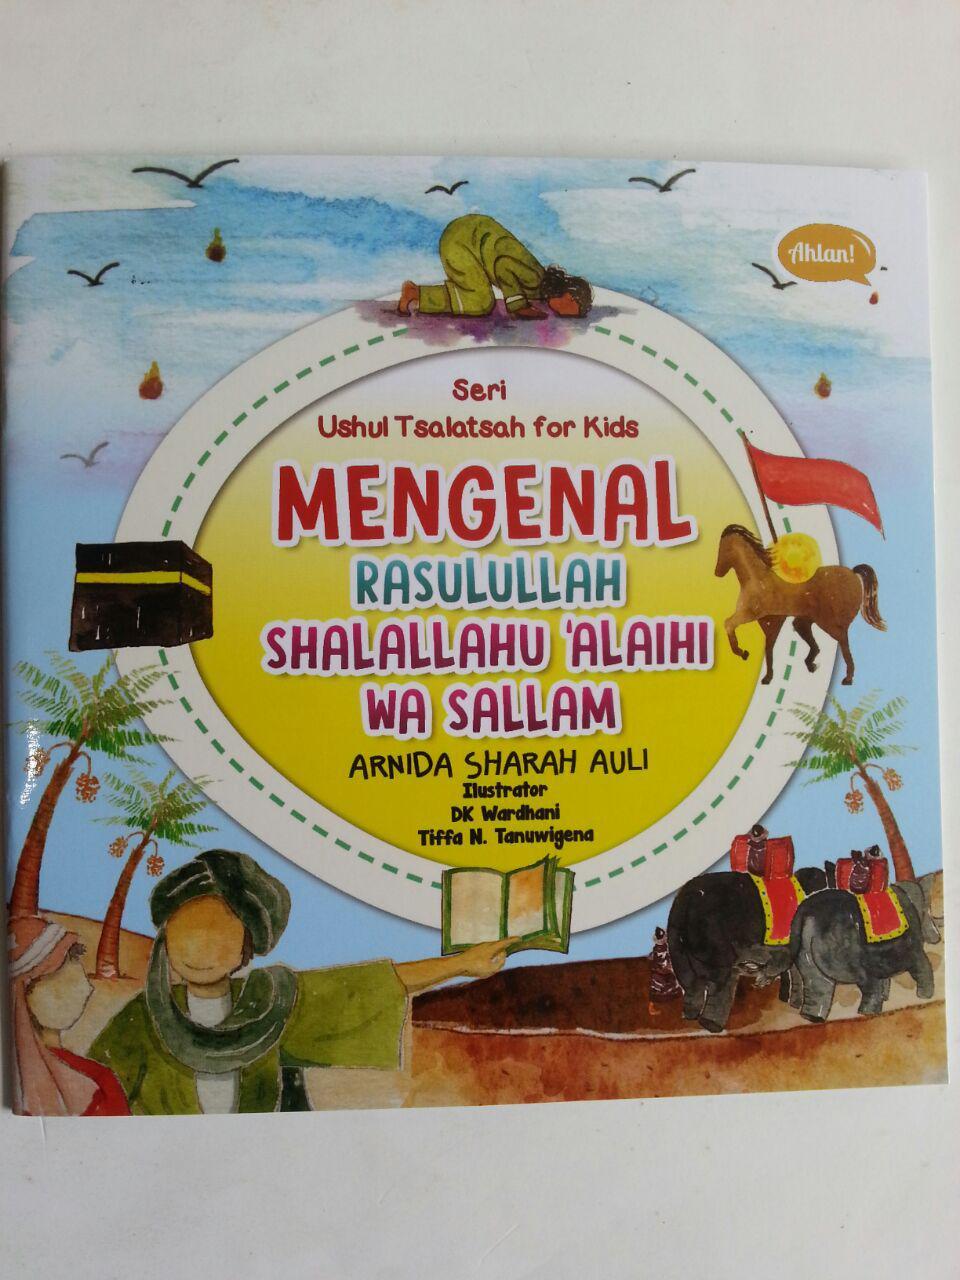 Buku Anak Seri Ushul Tsalatsah For Kids Mengenal Rasulullah cover